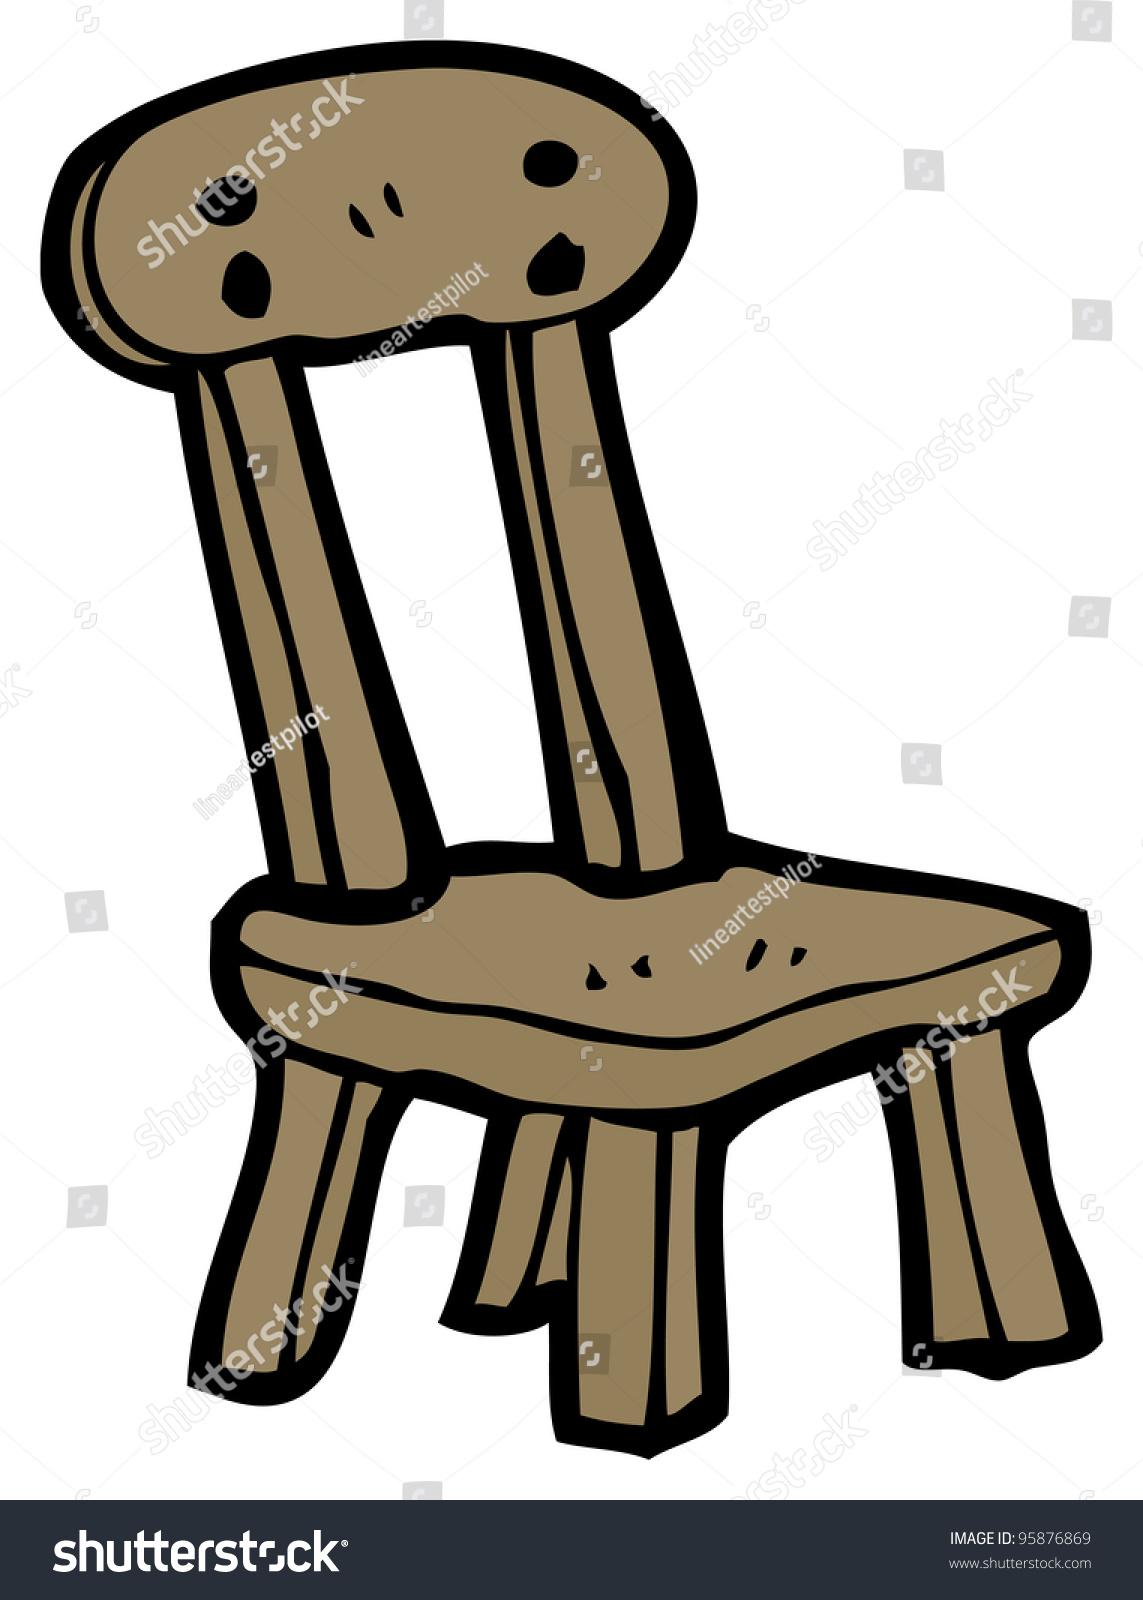 Old wood chair cartoon stock illustration